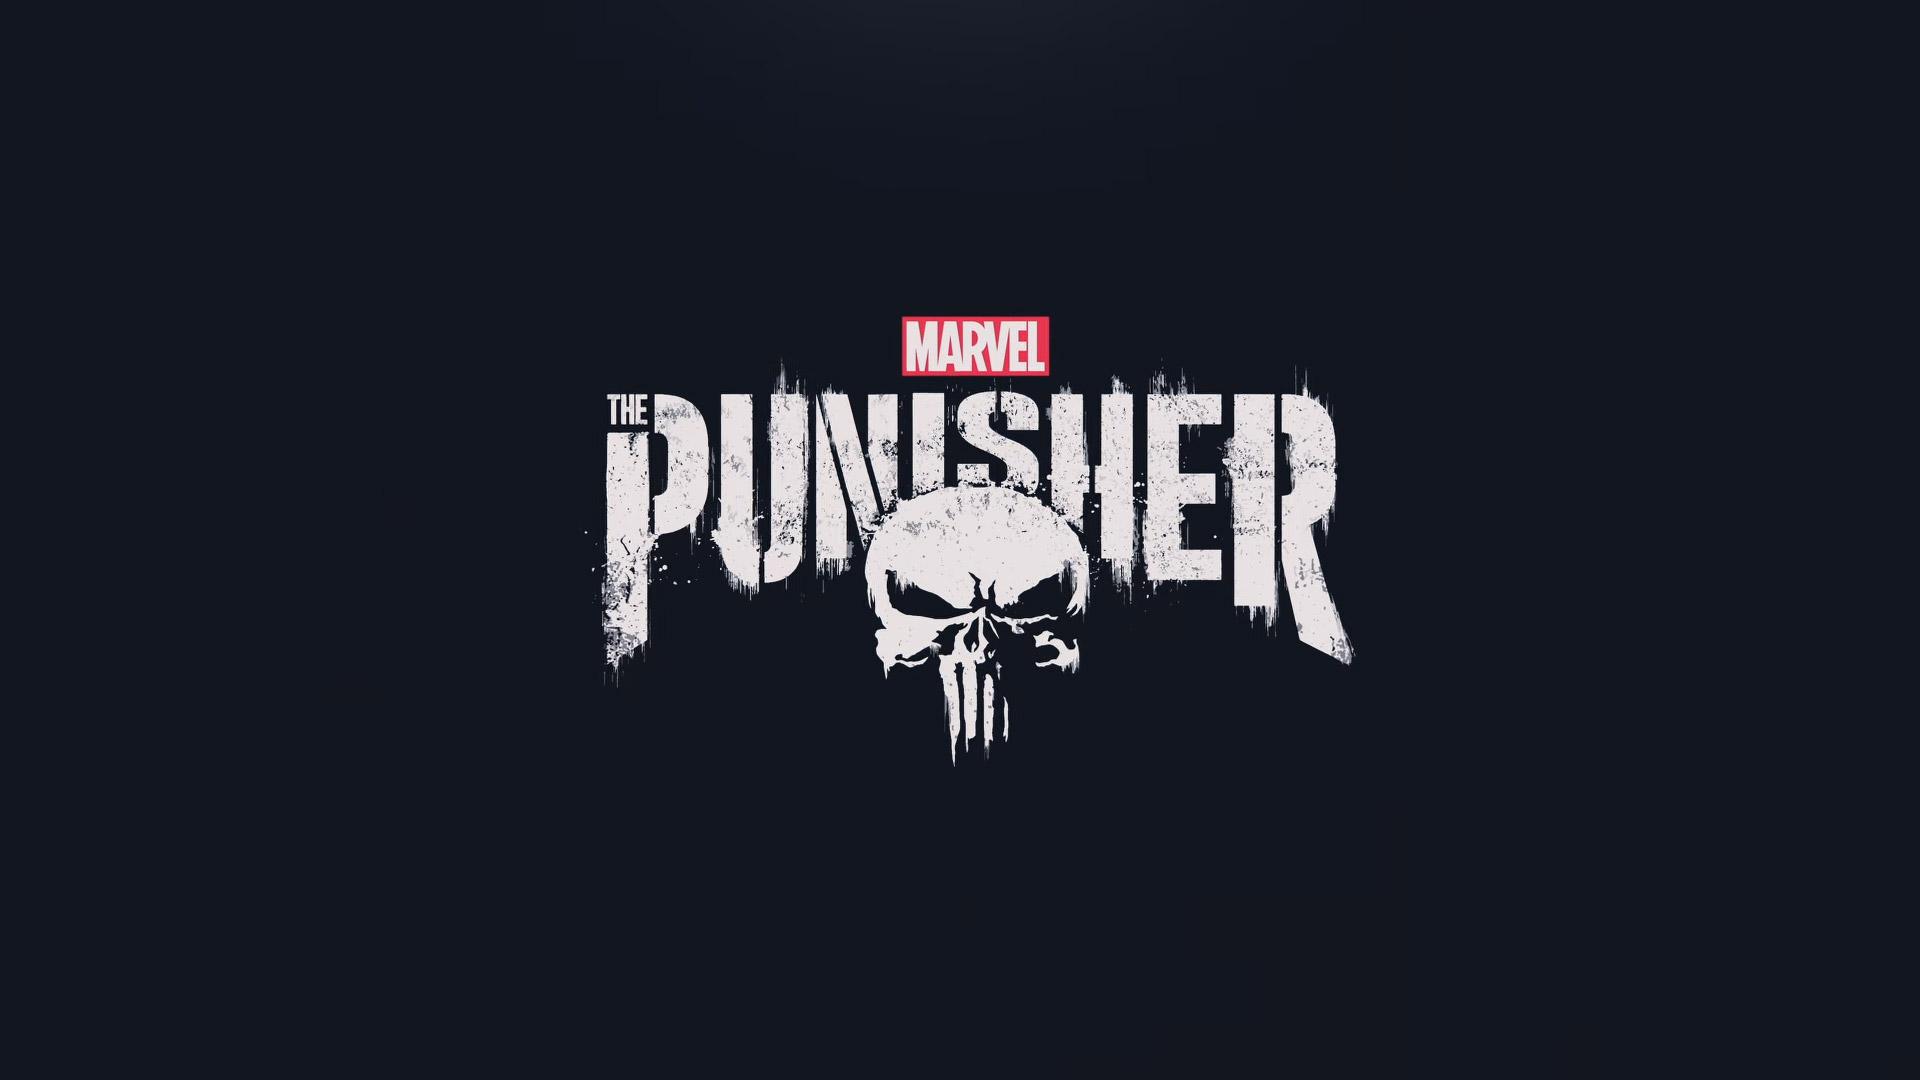 1920x1080 The Punisher 2017 Hd Logo Laptop Full Hd 1080p Hd 4k